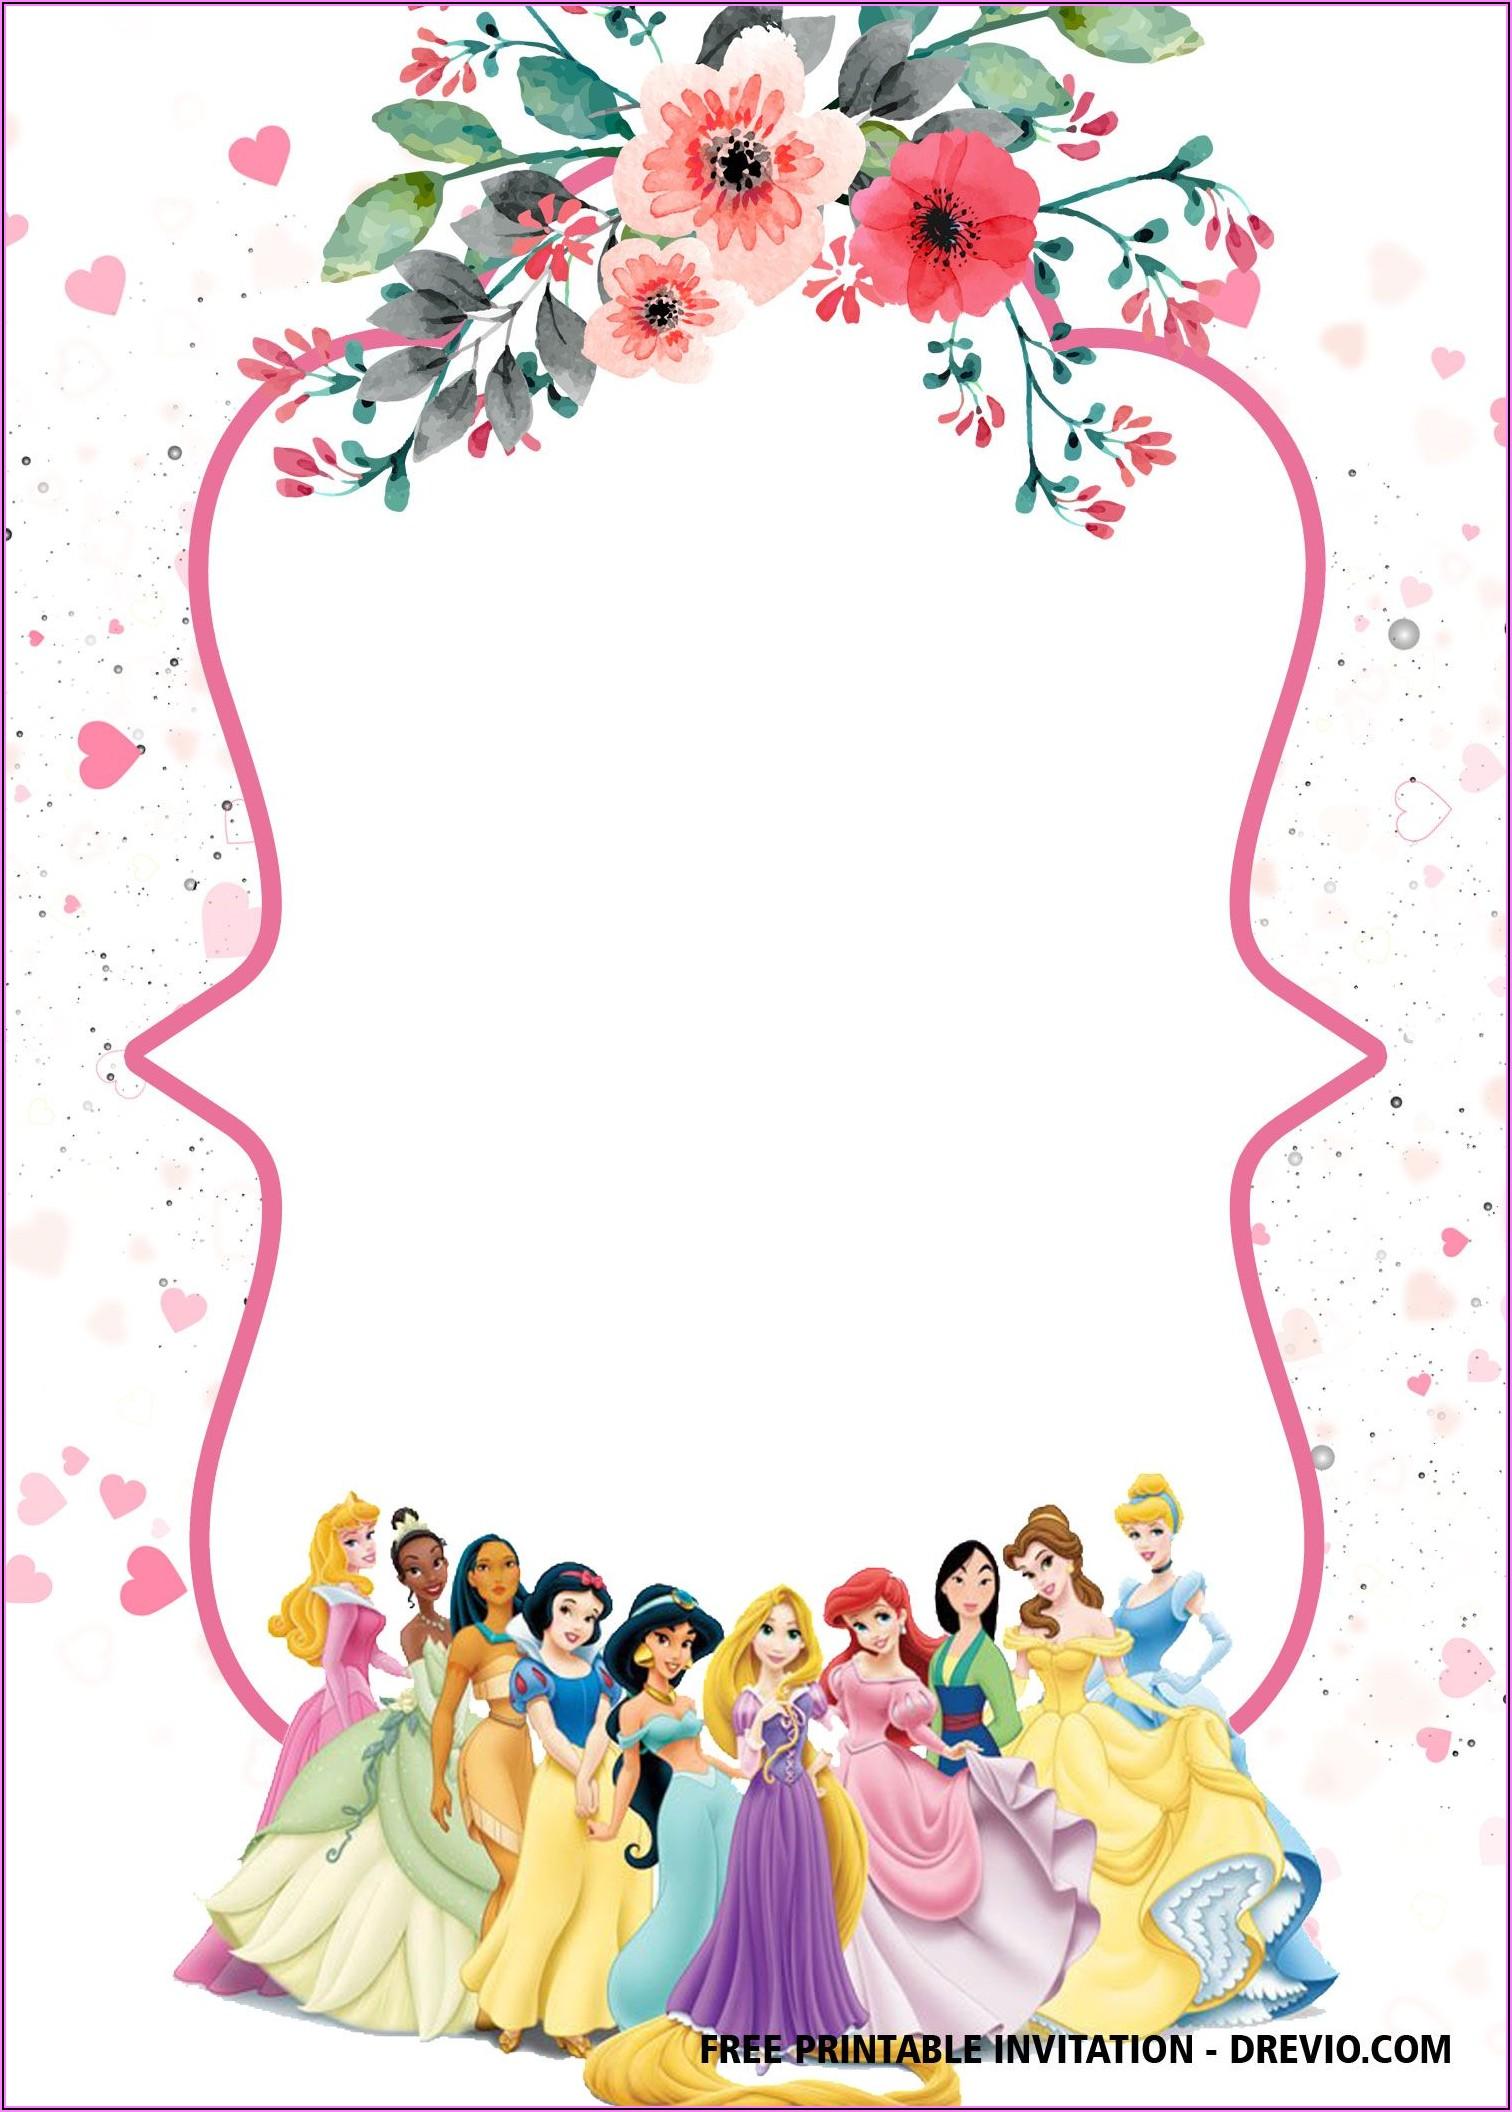 Disney Princesses Invitations Free Printable